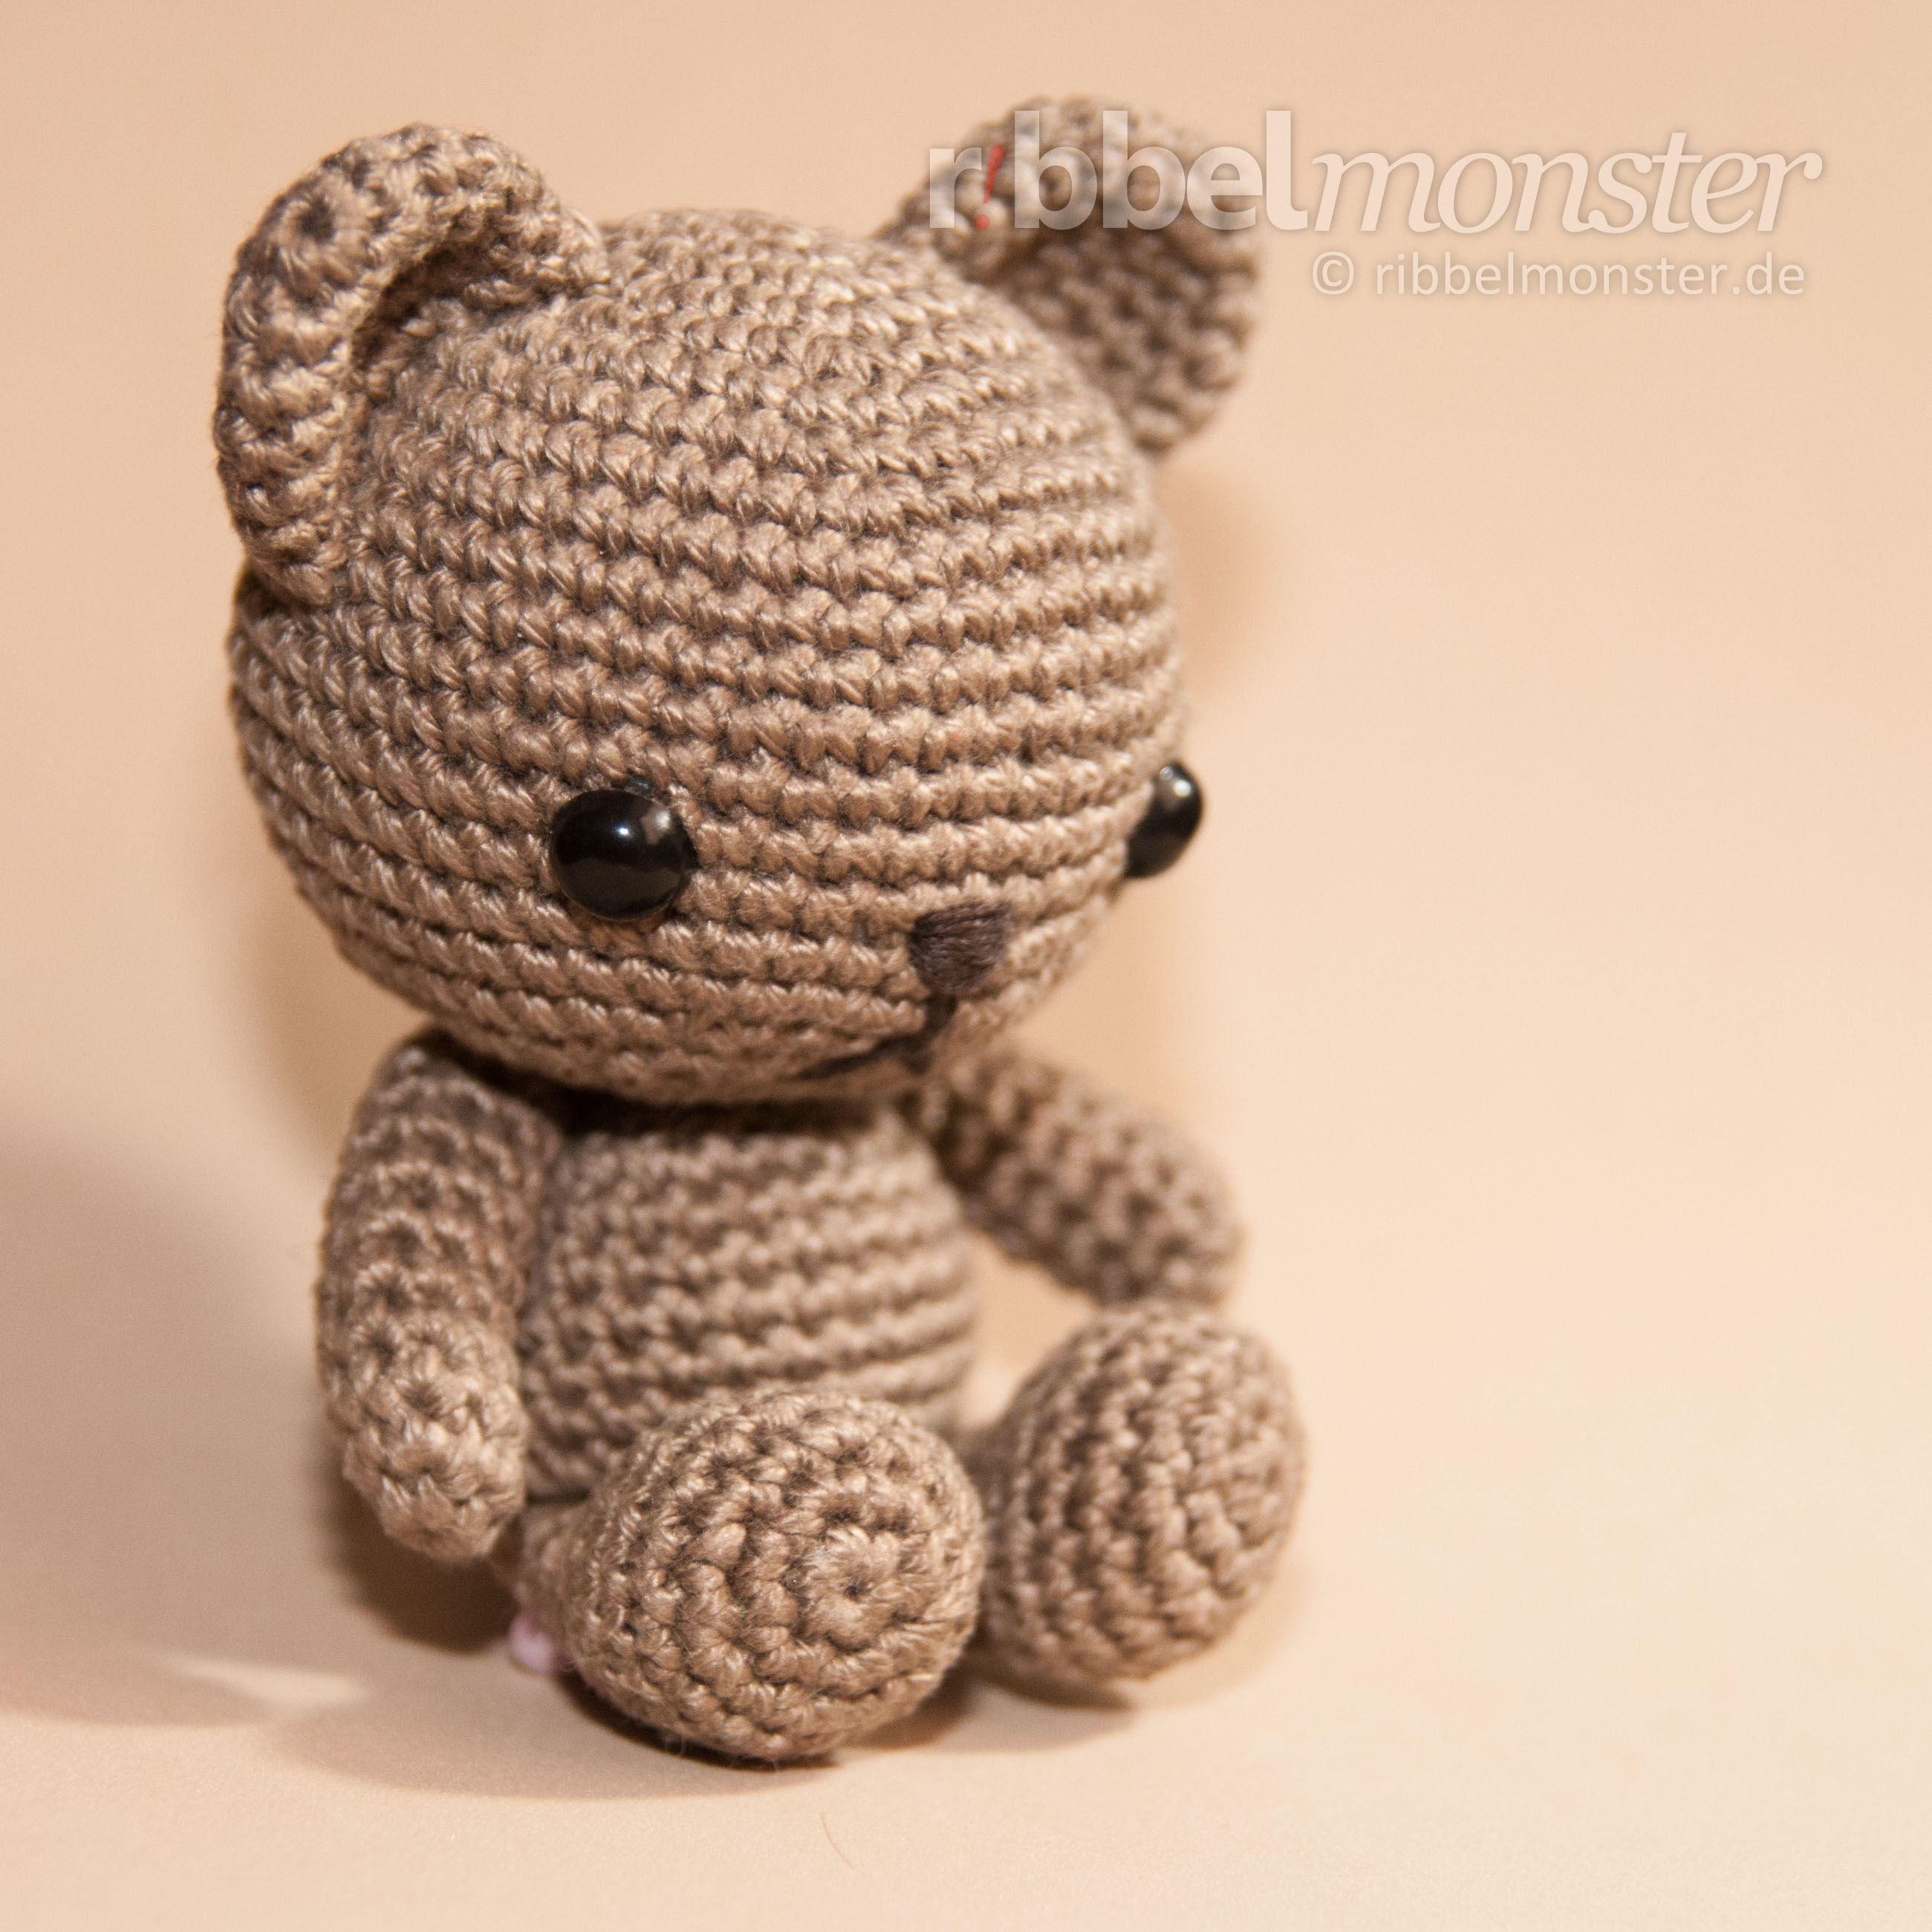 Anleitung Amigurumi Teddy häkeln Henry | crochet | Pinterest | Teddy ...